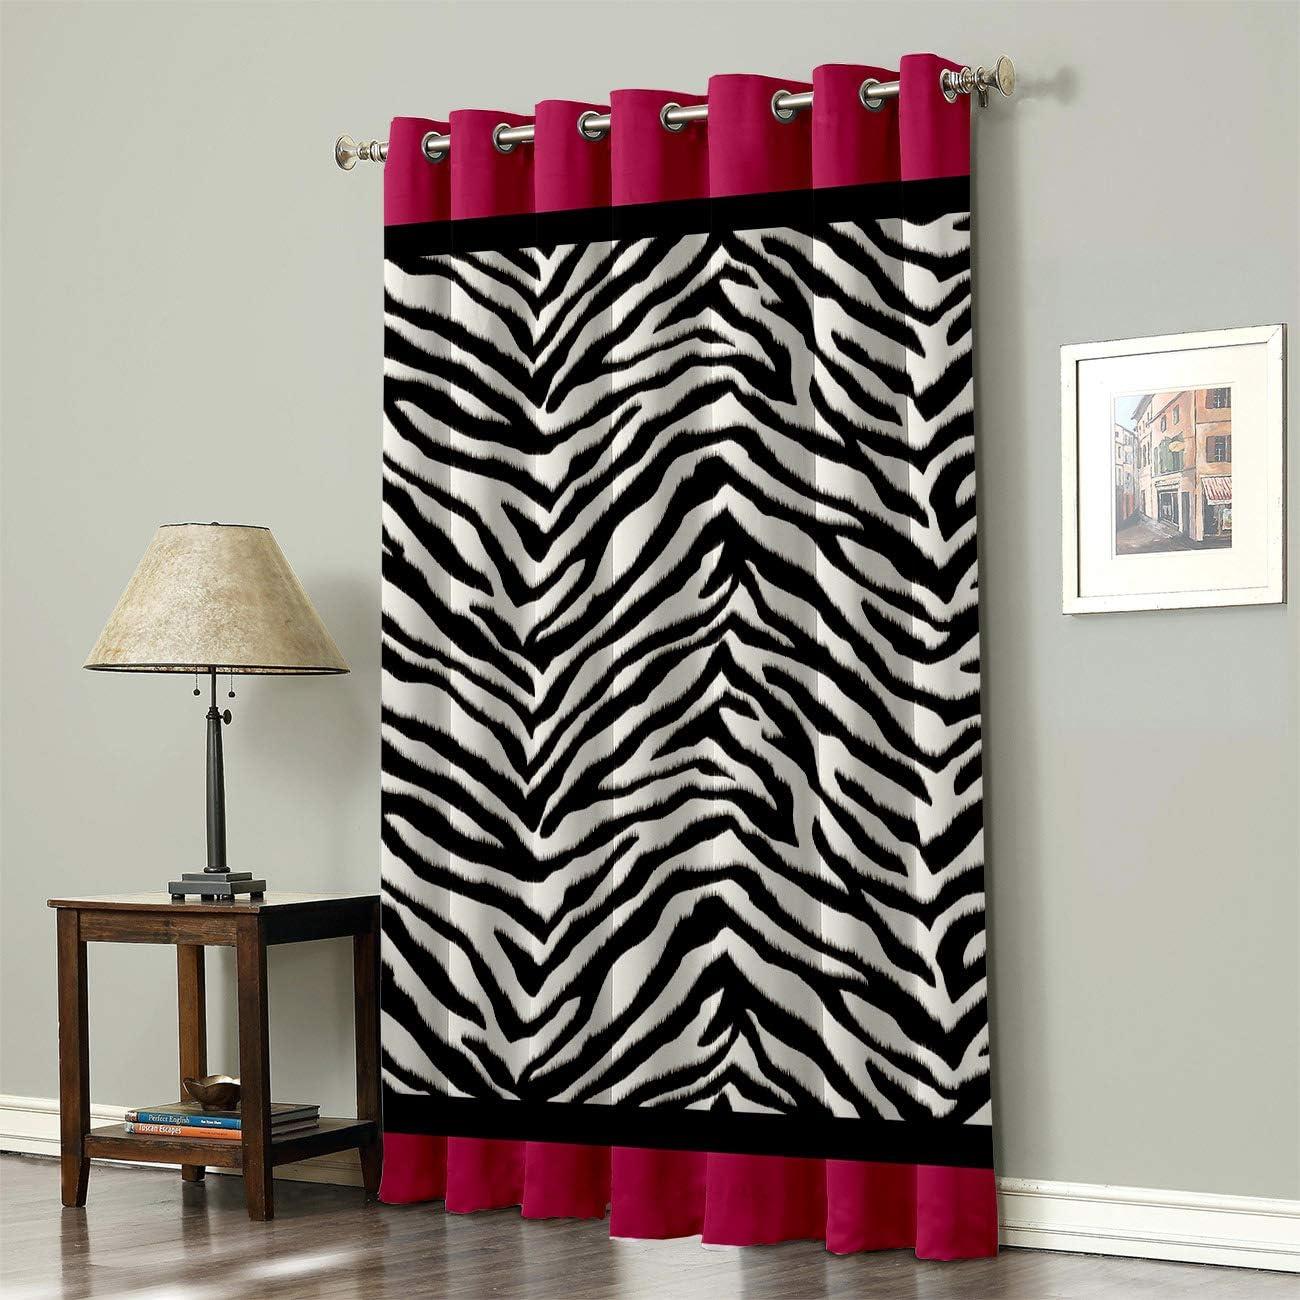 SODIKA プレゼント Grommet Top Curtains for Living ご予約品 Window Treat Bedroom Room